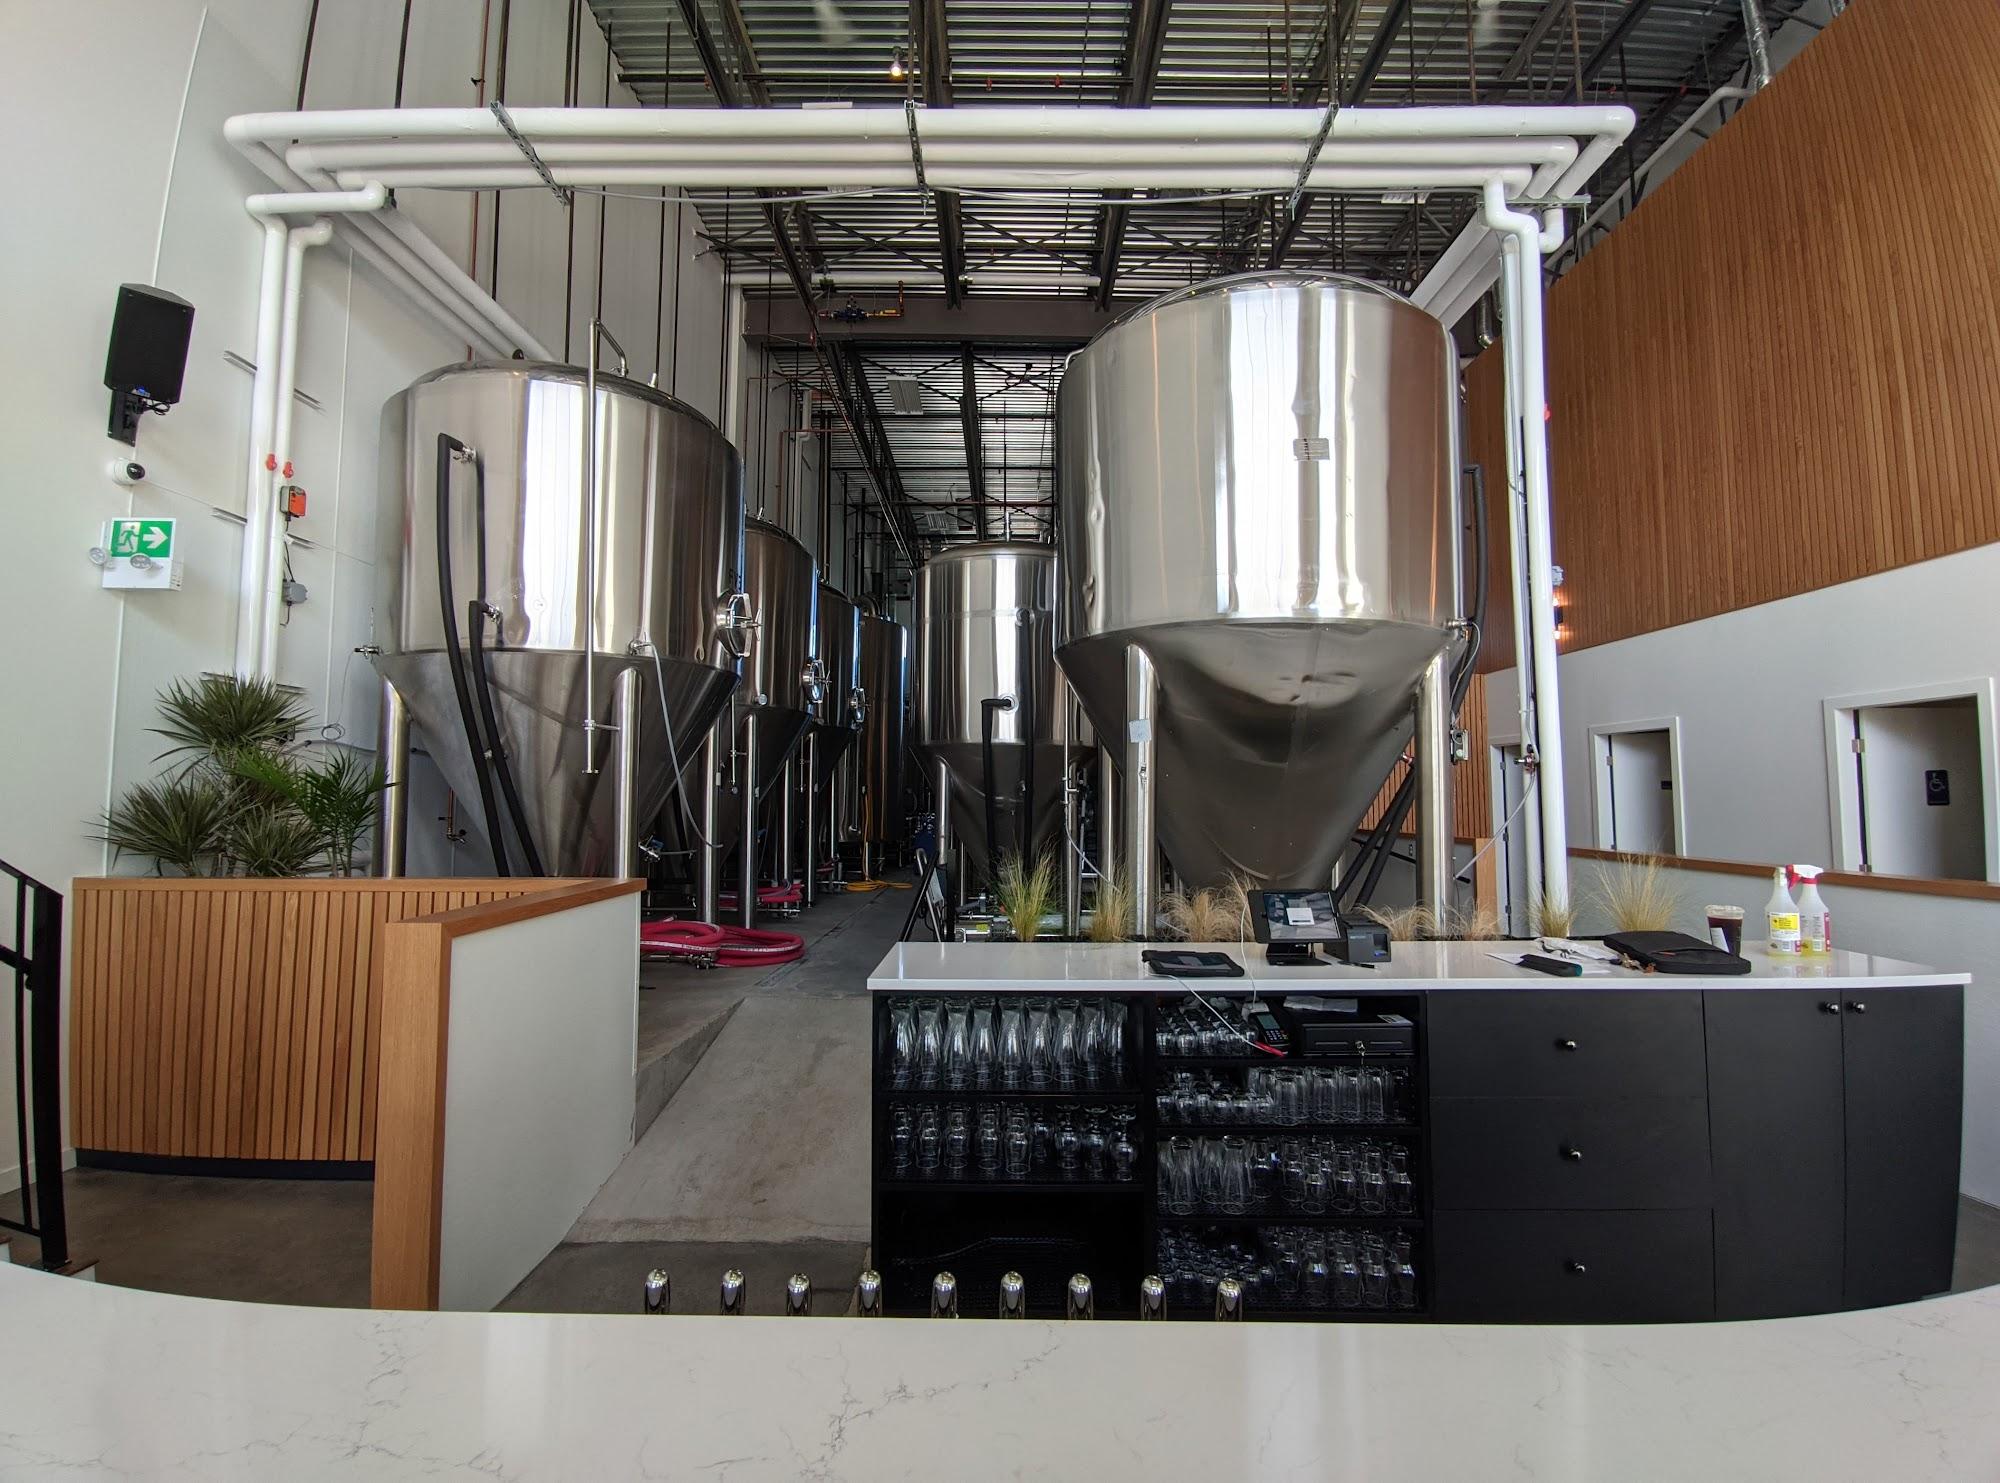 Boardwalk Brewery 575 Seaborne Ave Unit 2155, Port Coquitlam